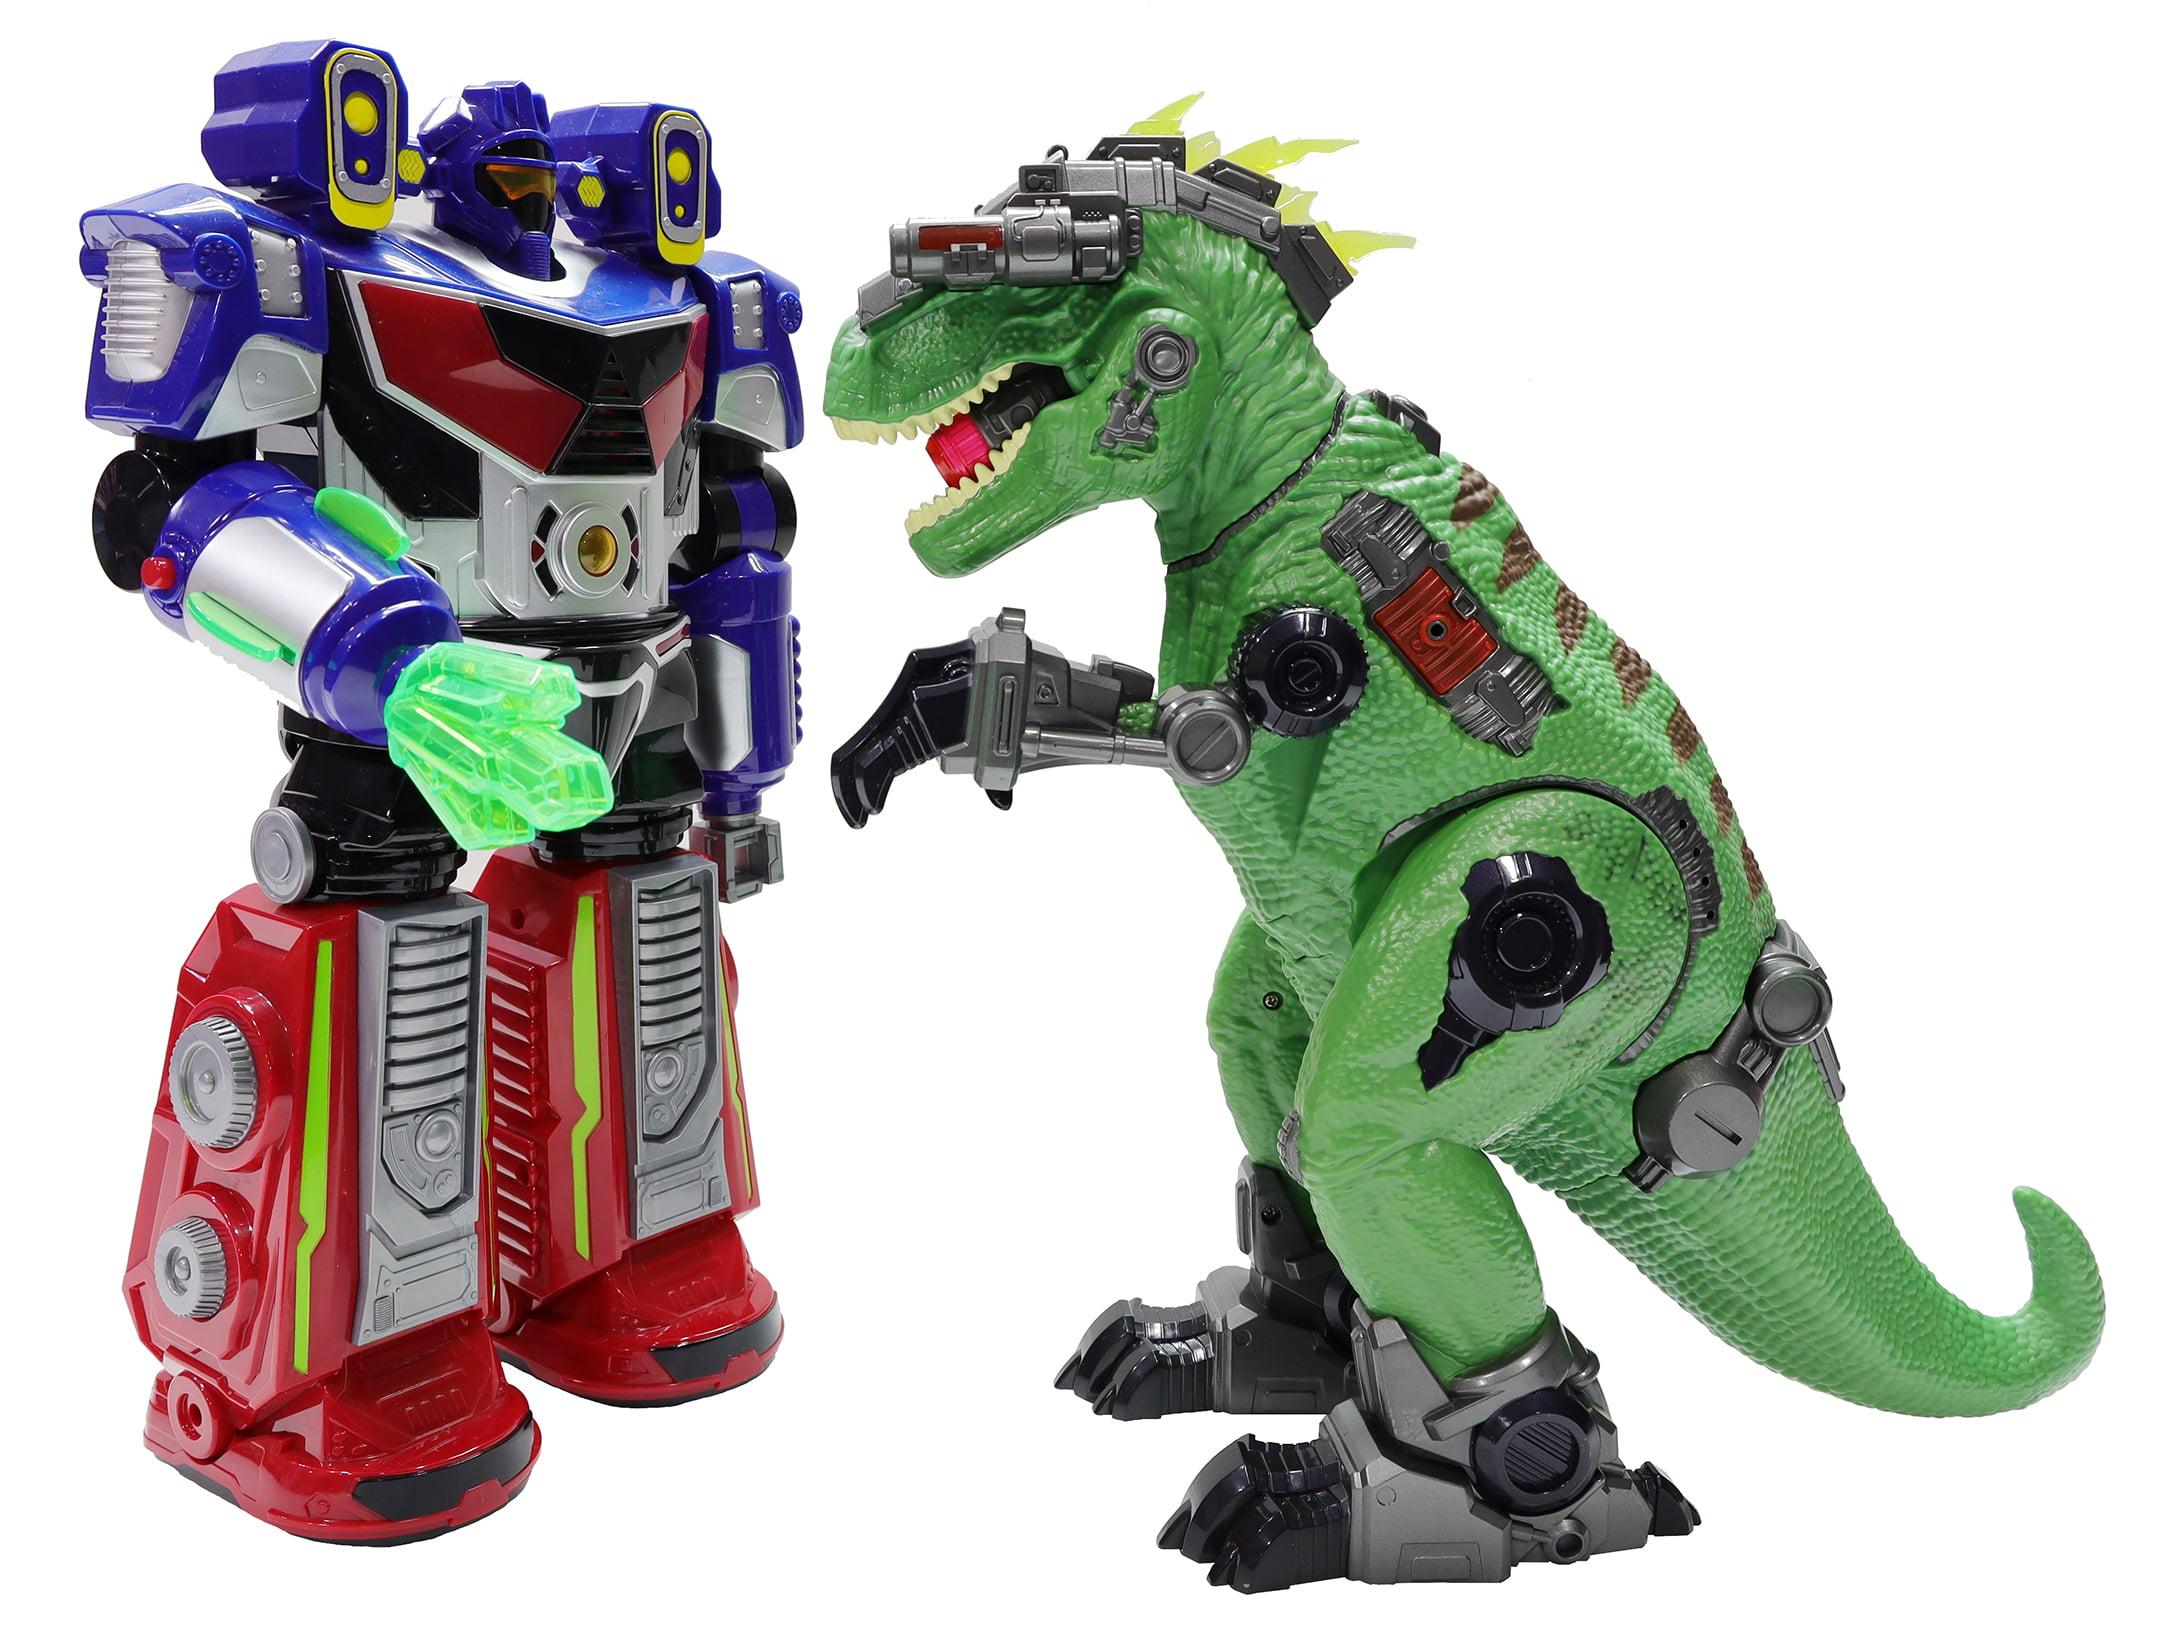 Adventure Force Ultra Exosaur Robotic Dinosaur